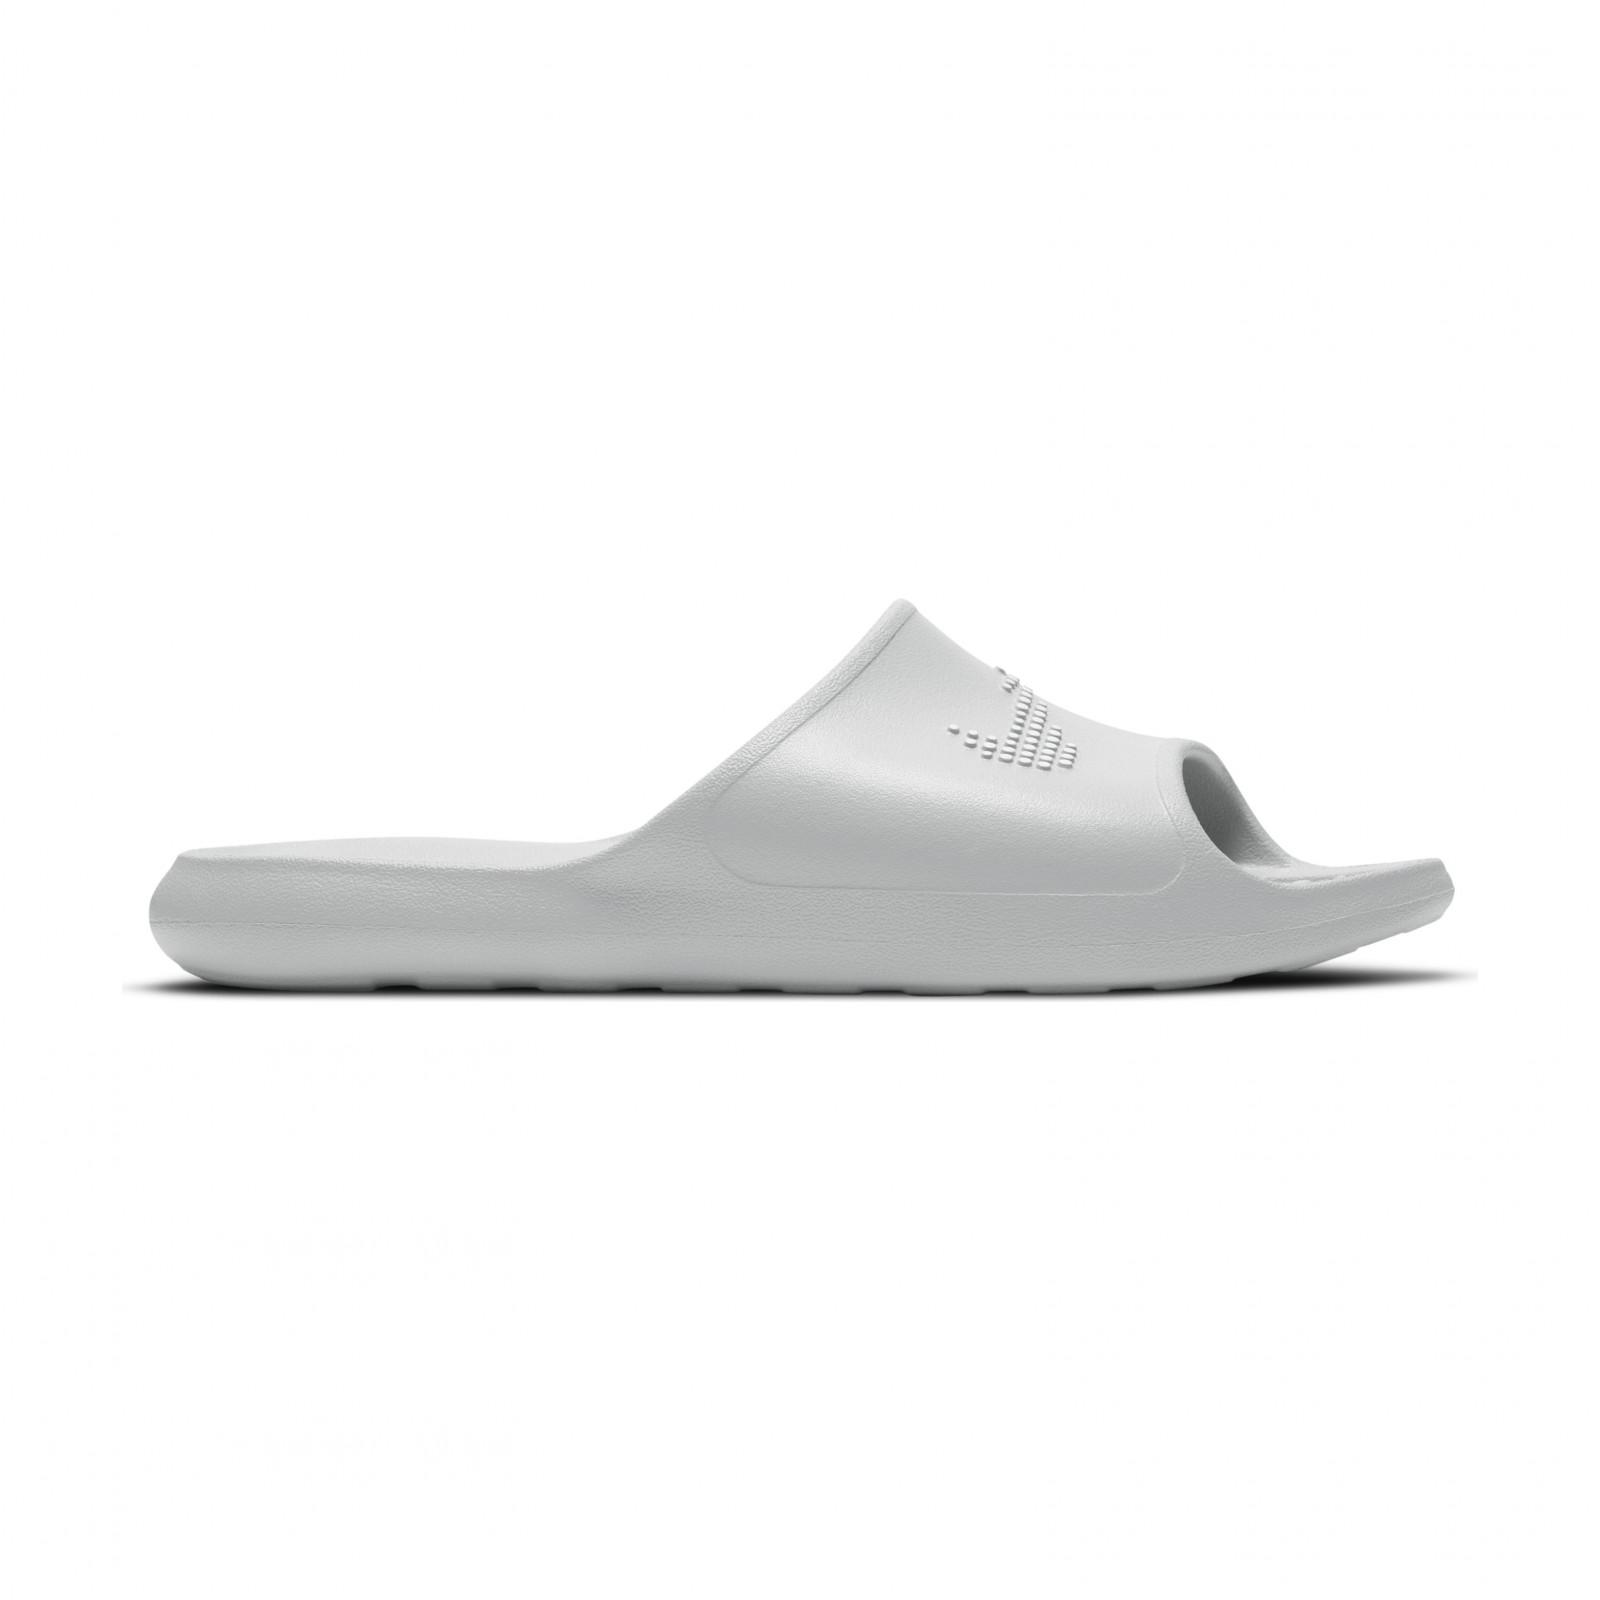 Nike Victori One LT SMOKE GREY/WHITE-LT SMOKE GREY